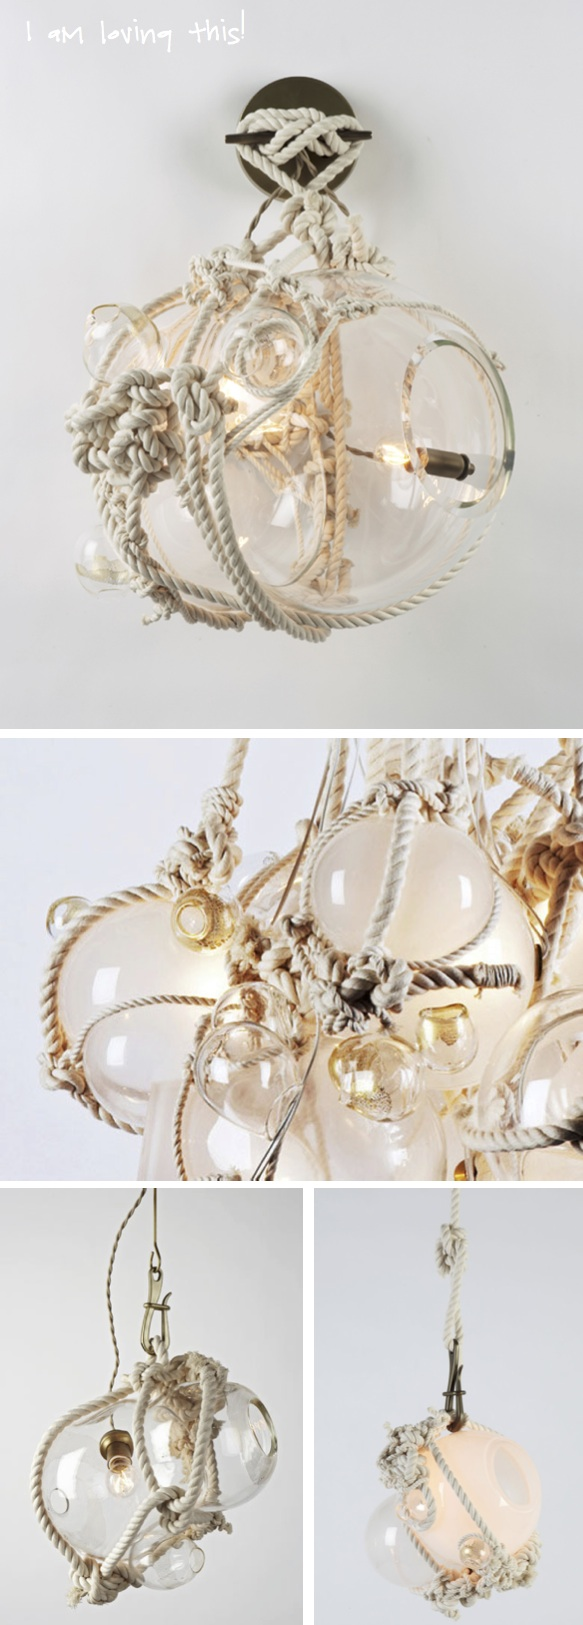 Kristina Crestin Design_lindseyadelman